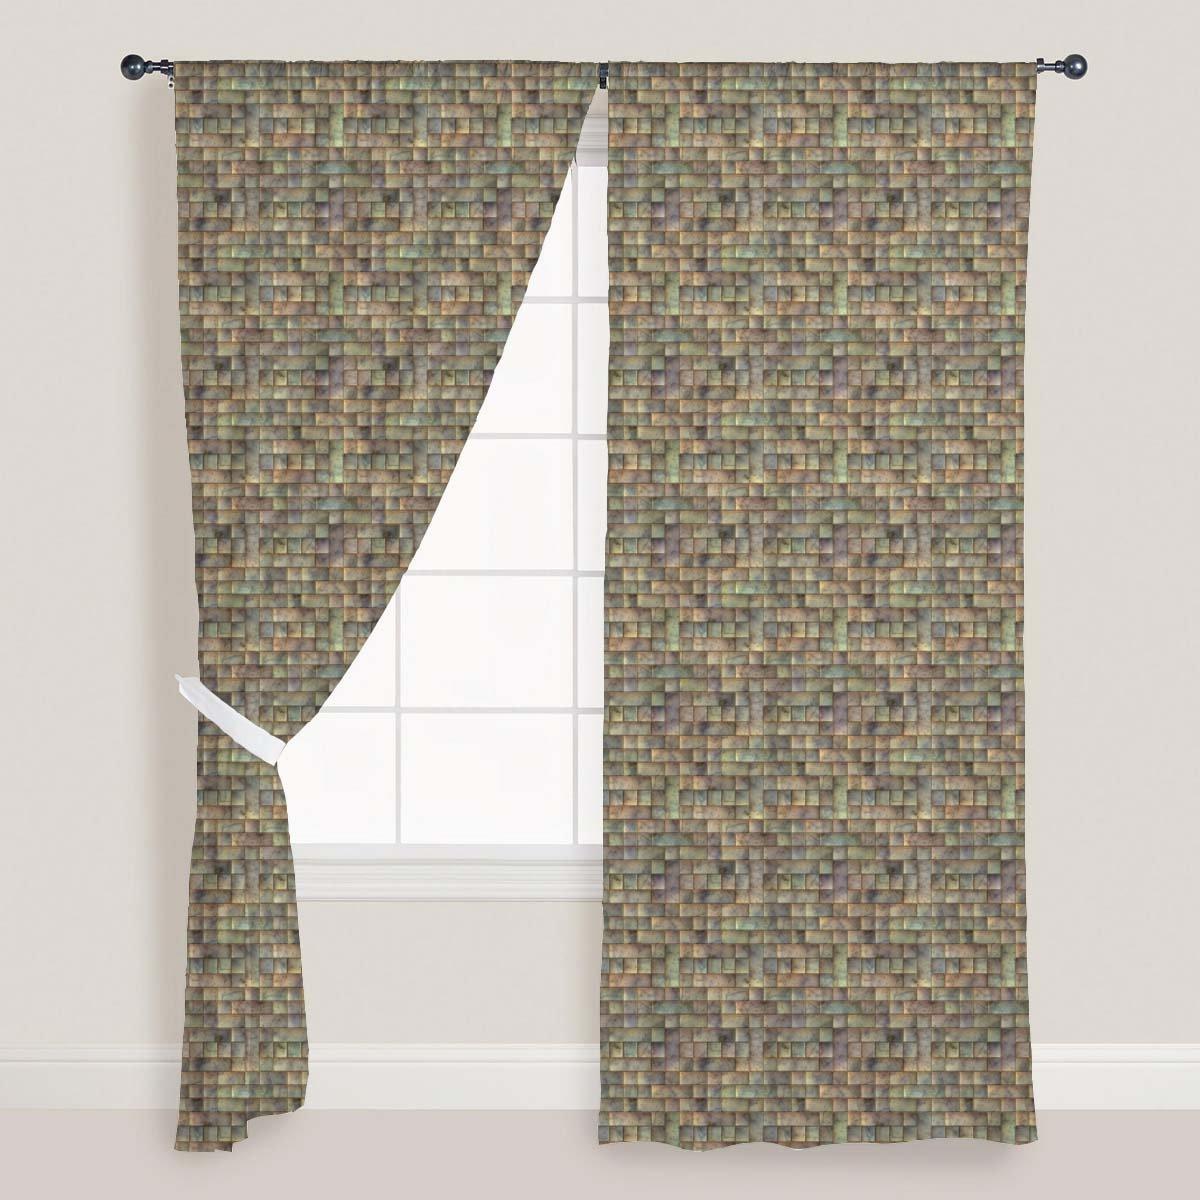 AZ Tiled Art Door & Window Curtain Satin 4feet x 7feet; SET OF 3 PCS